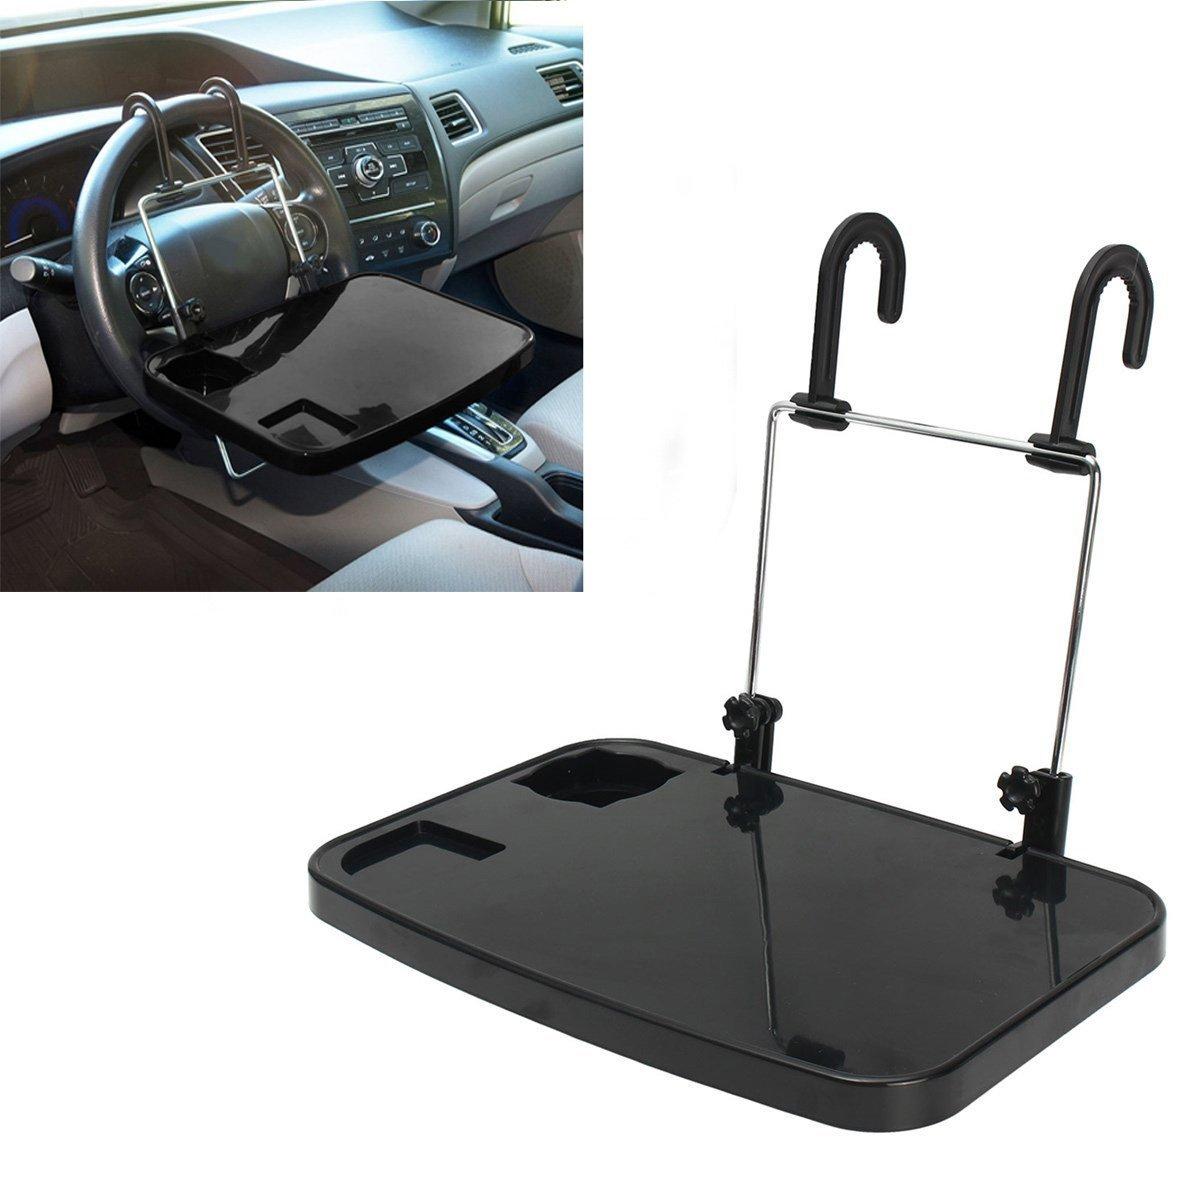 Soporte de pedestal portá til de coches plegable con bandeja para portá tiles, tabletas, PC, iPad, comidas, bebidas y tazas, 35 x 23 x 2 cm, de color negro DaoRier TRTAZ11A